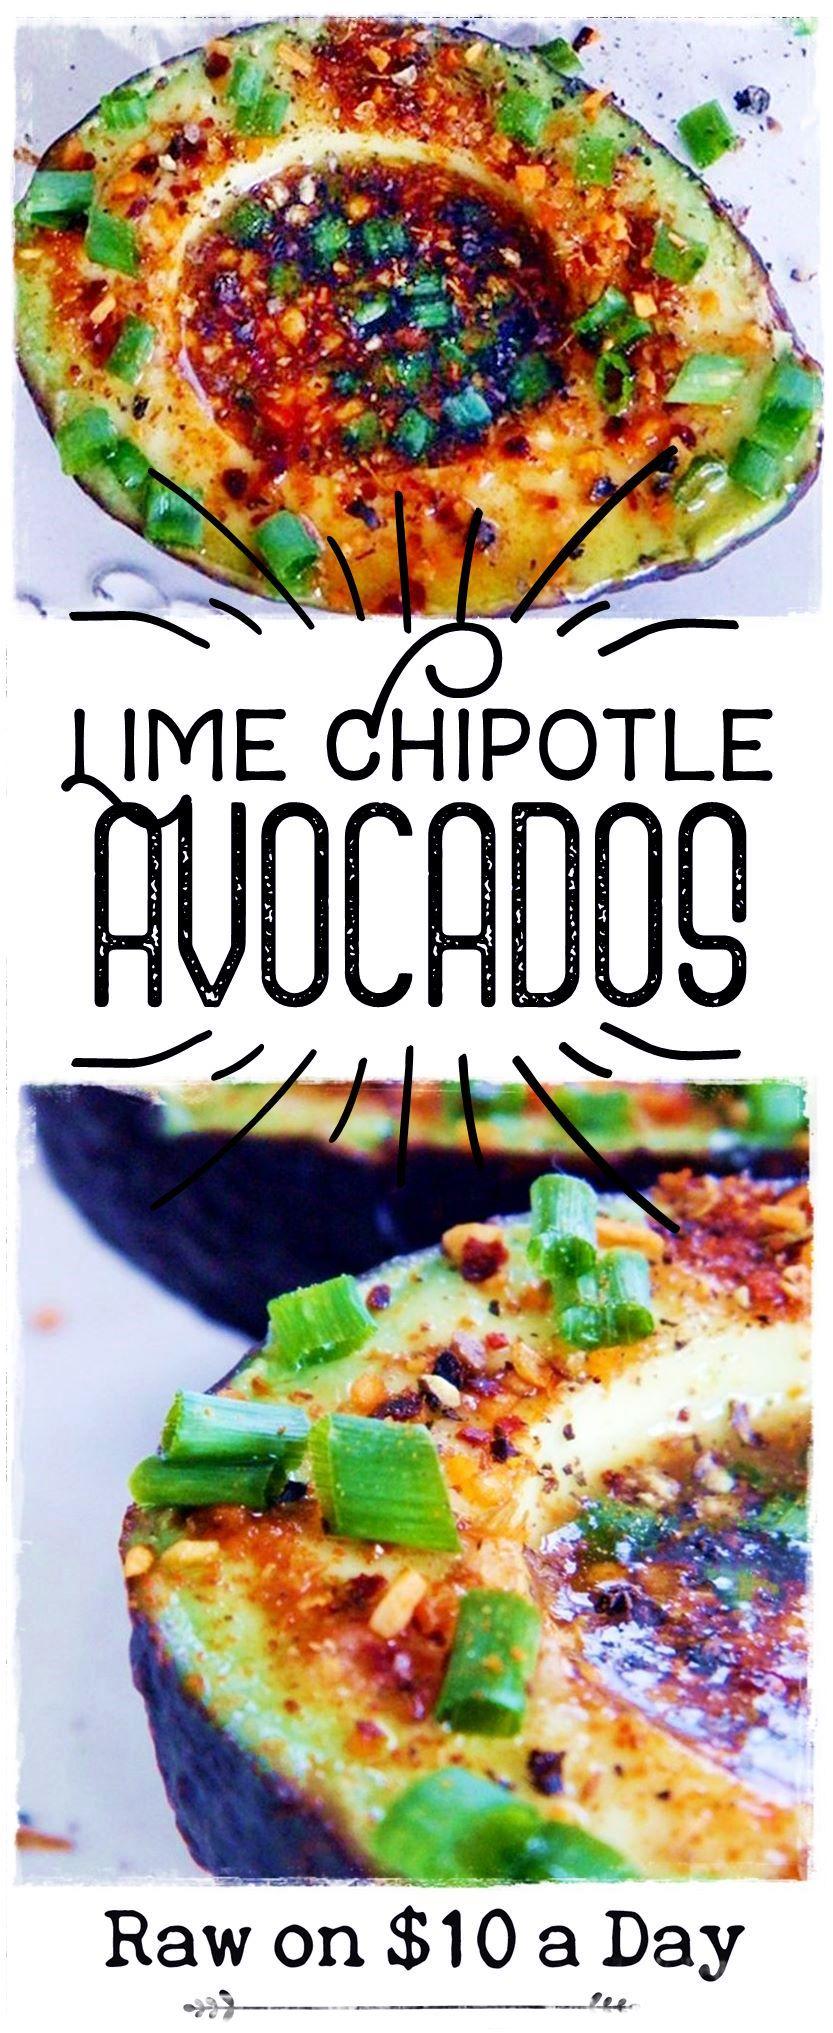 Lime Chipotle Avocados Easy Healthy Raw Food Recipe from Rawon10 #rawfood #easyrawfood #rawfoodrecipe #spicy #avocados PIN IT